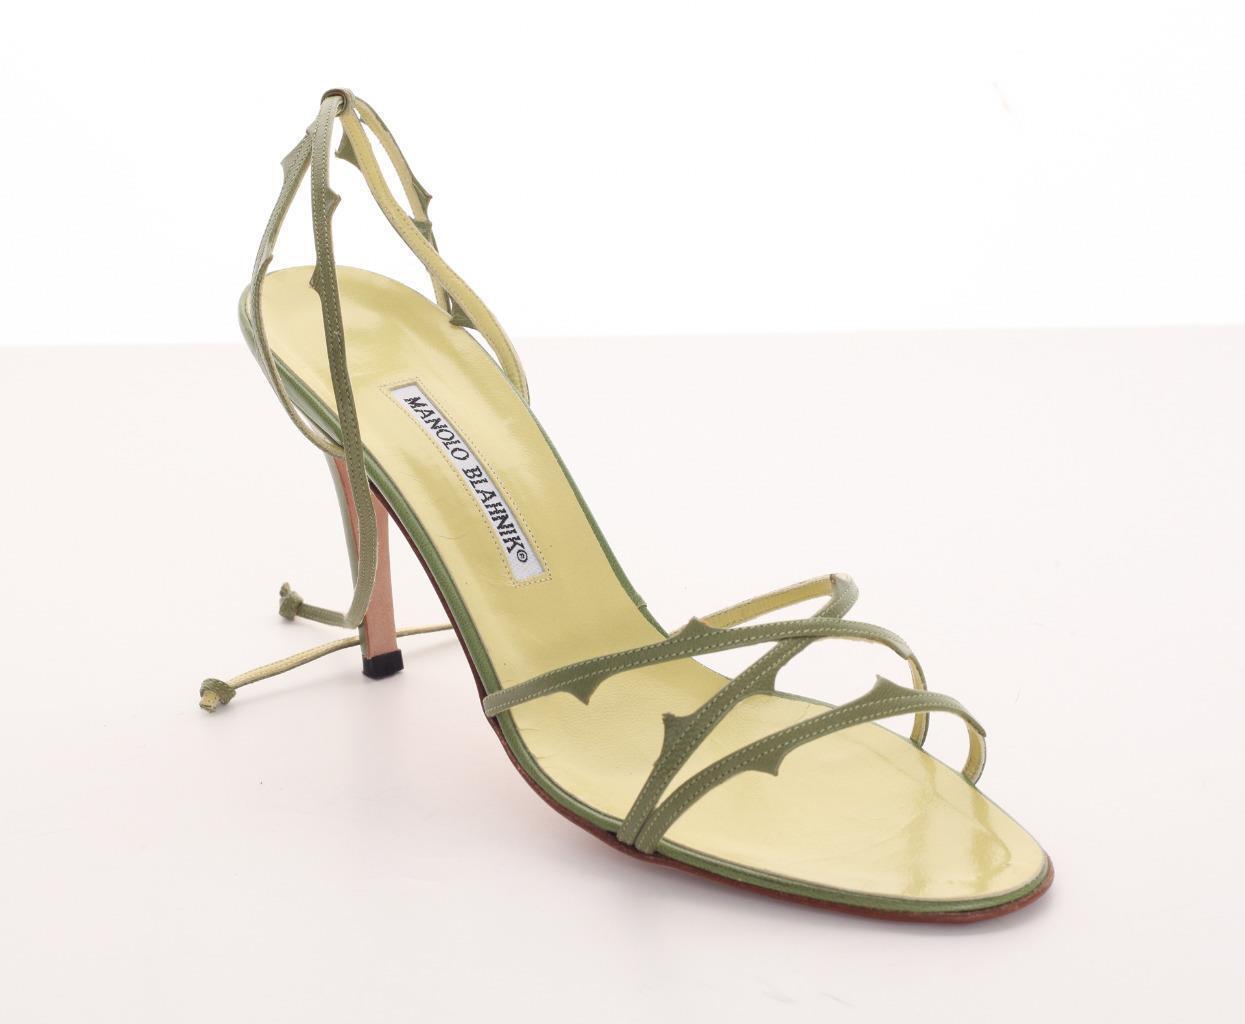 MANOLO BLAHNIK Lime vert Leather High Heel Multi-Strap Sandal Pump 9.5-39.5